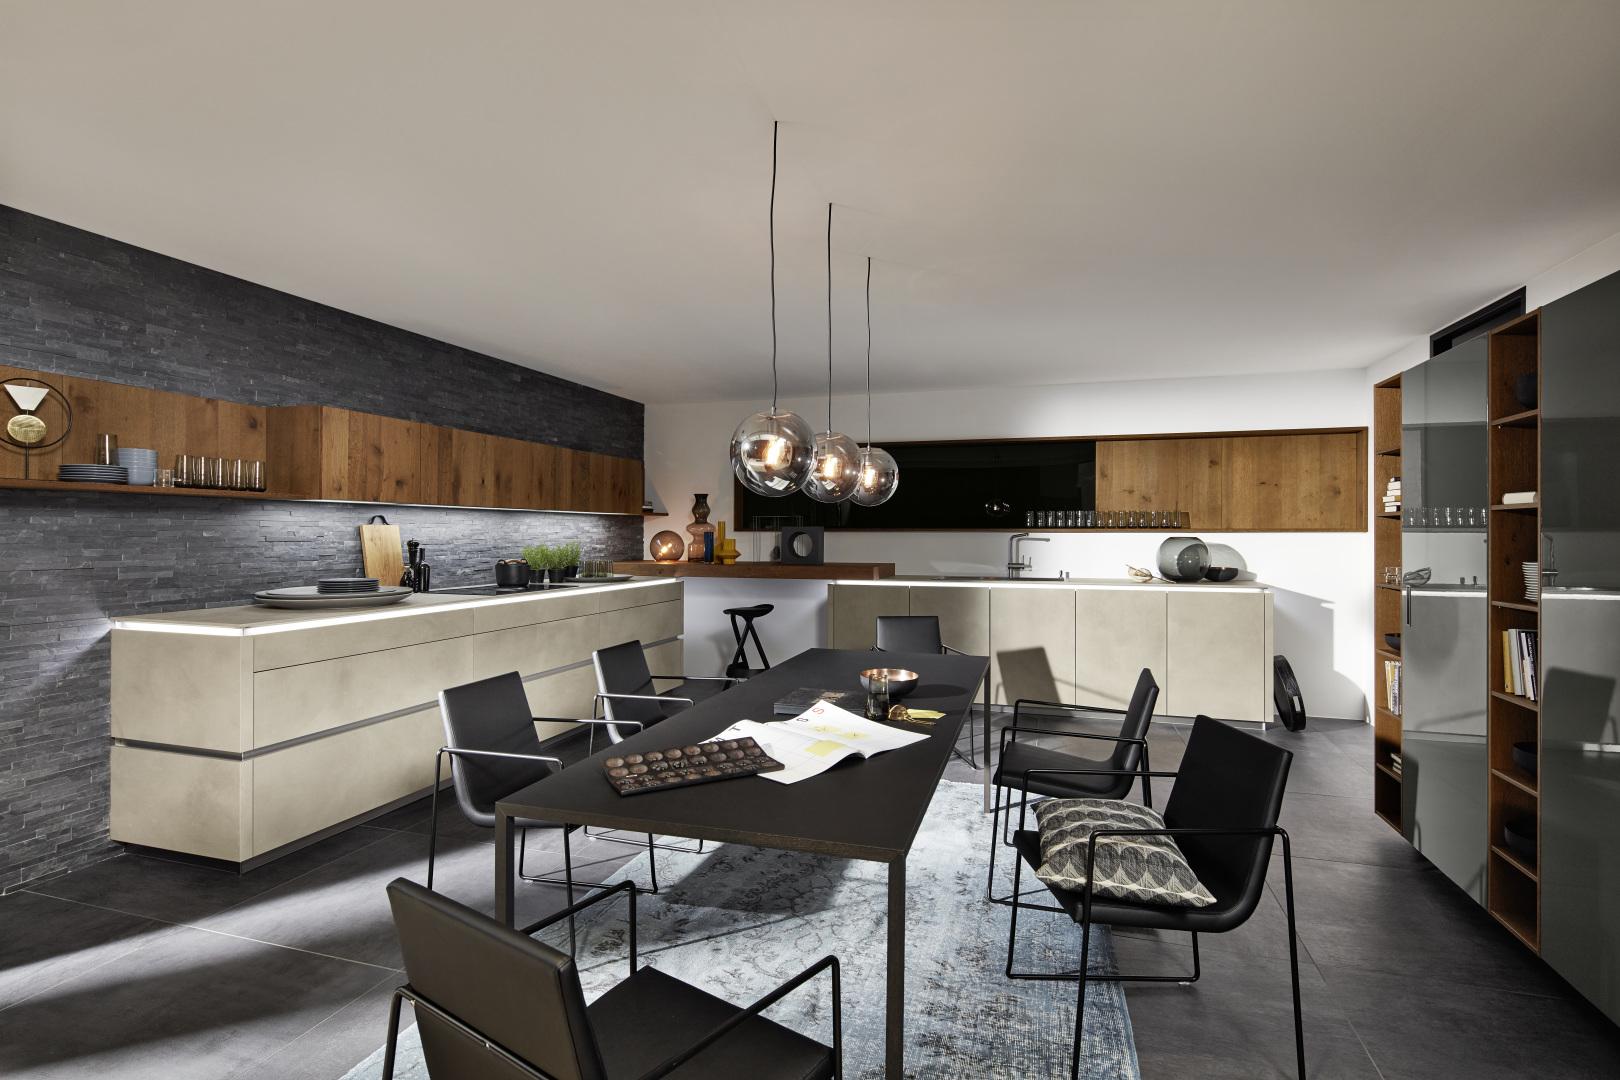 grifflose k chen online planen kaufen k chenexperte hannover. Black Bedroom Furniture Sets. Home Design Ideas